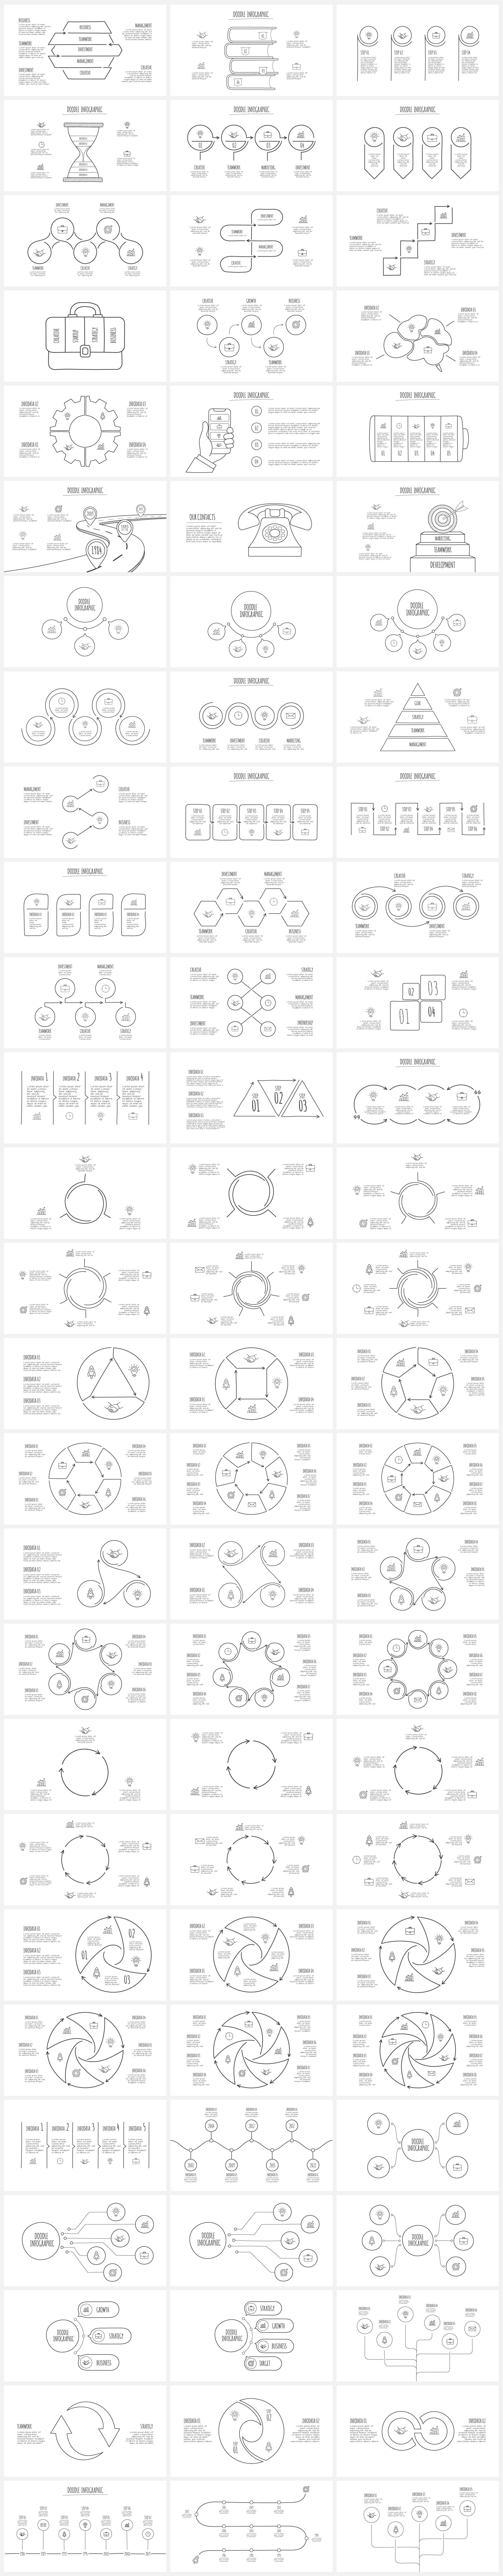 Multipurpose Infographics PowerPoint Templates v.5.0 - 143